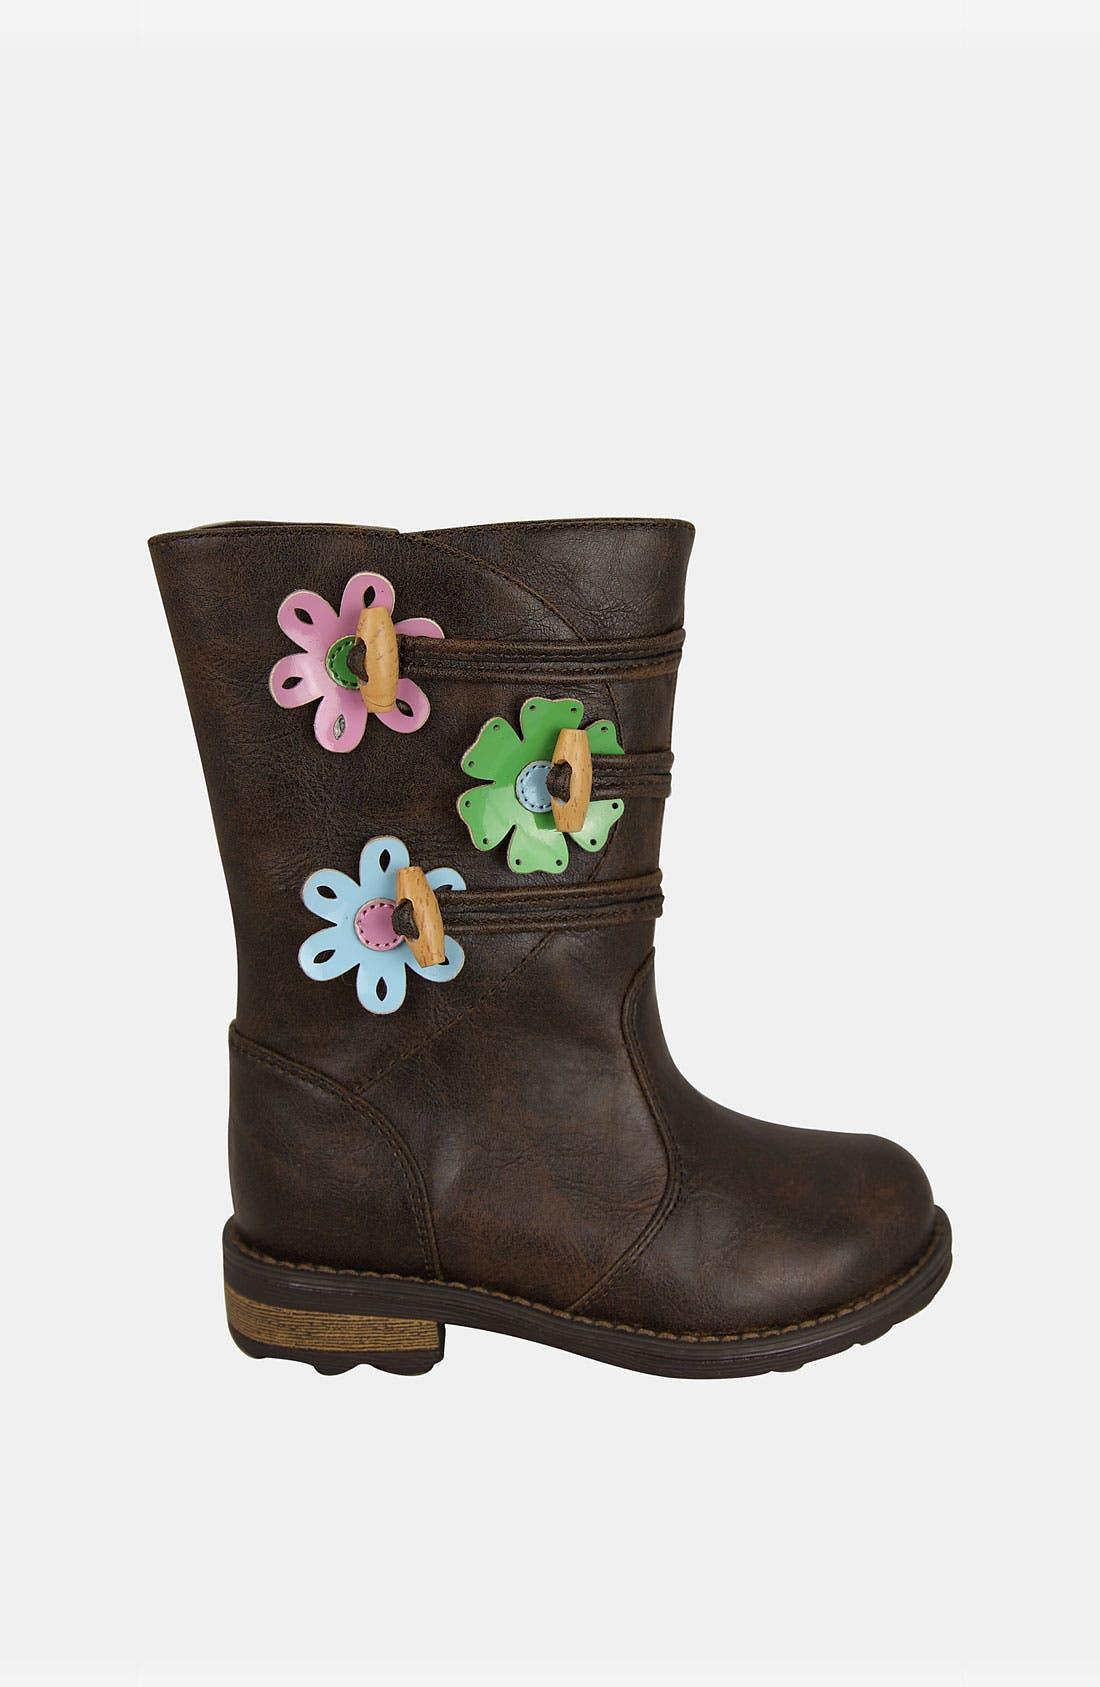 Alternate Image 1 Selected - Nina 'Deedee' Flower Boot (Walker & Toddler)